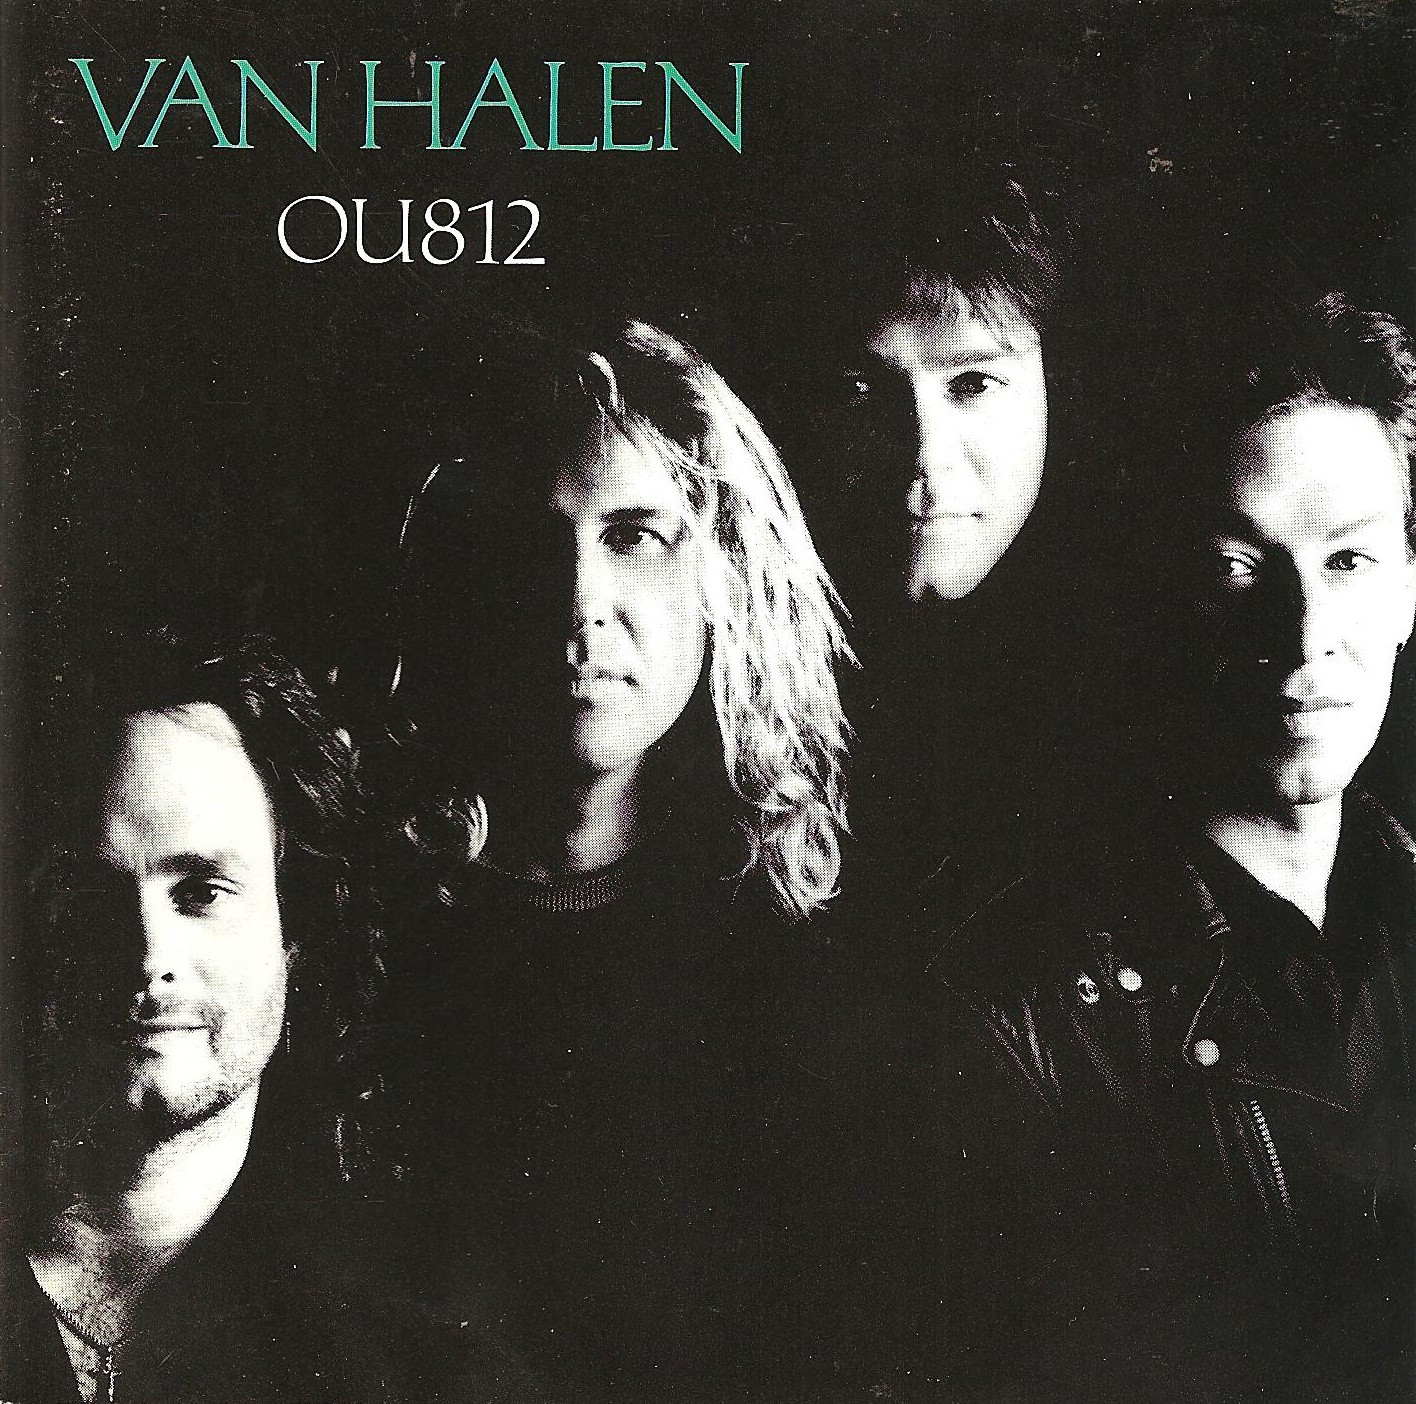 OU812 (1988)